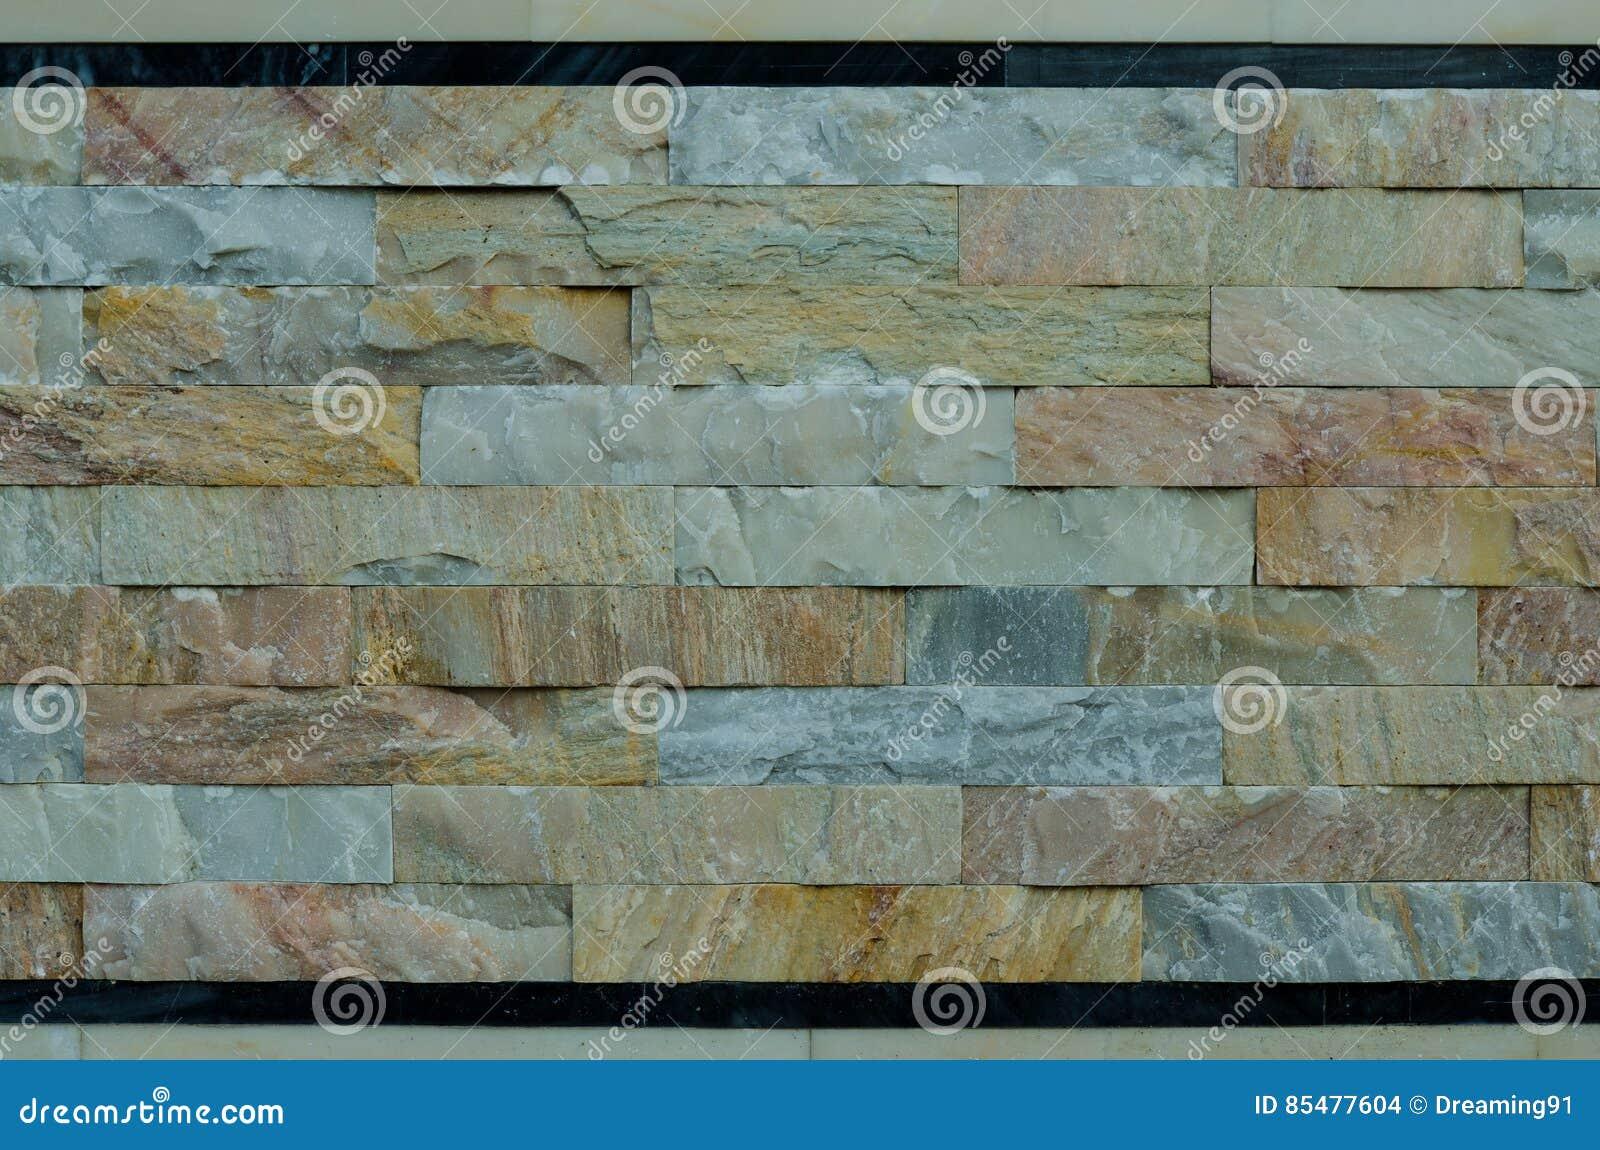 Het nieuwe ontwerp van moderne muur stock foto afbeelding 85477604 - Nieuwe ontwerpmuur ...